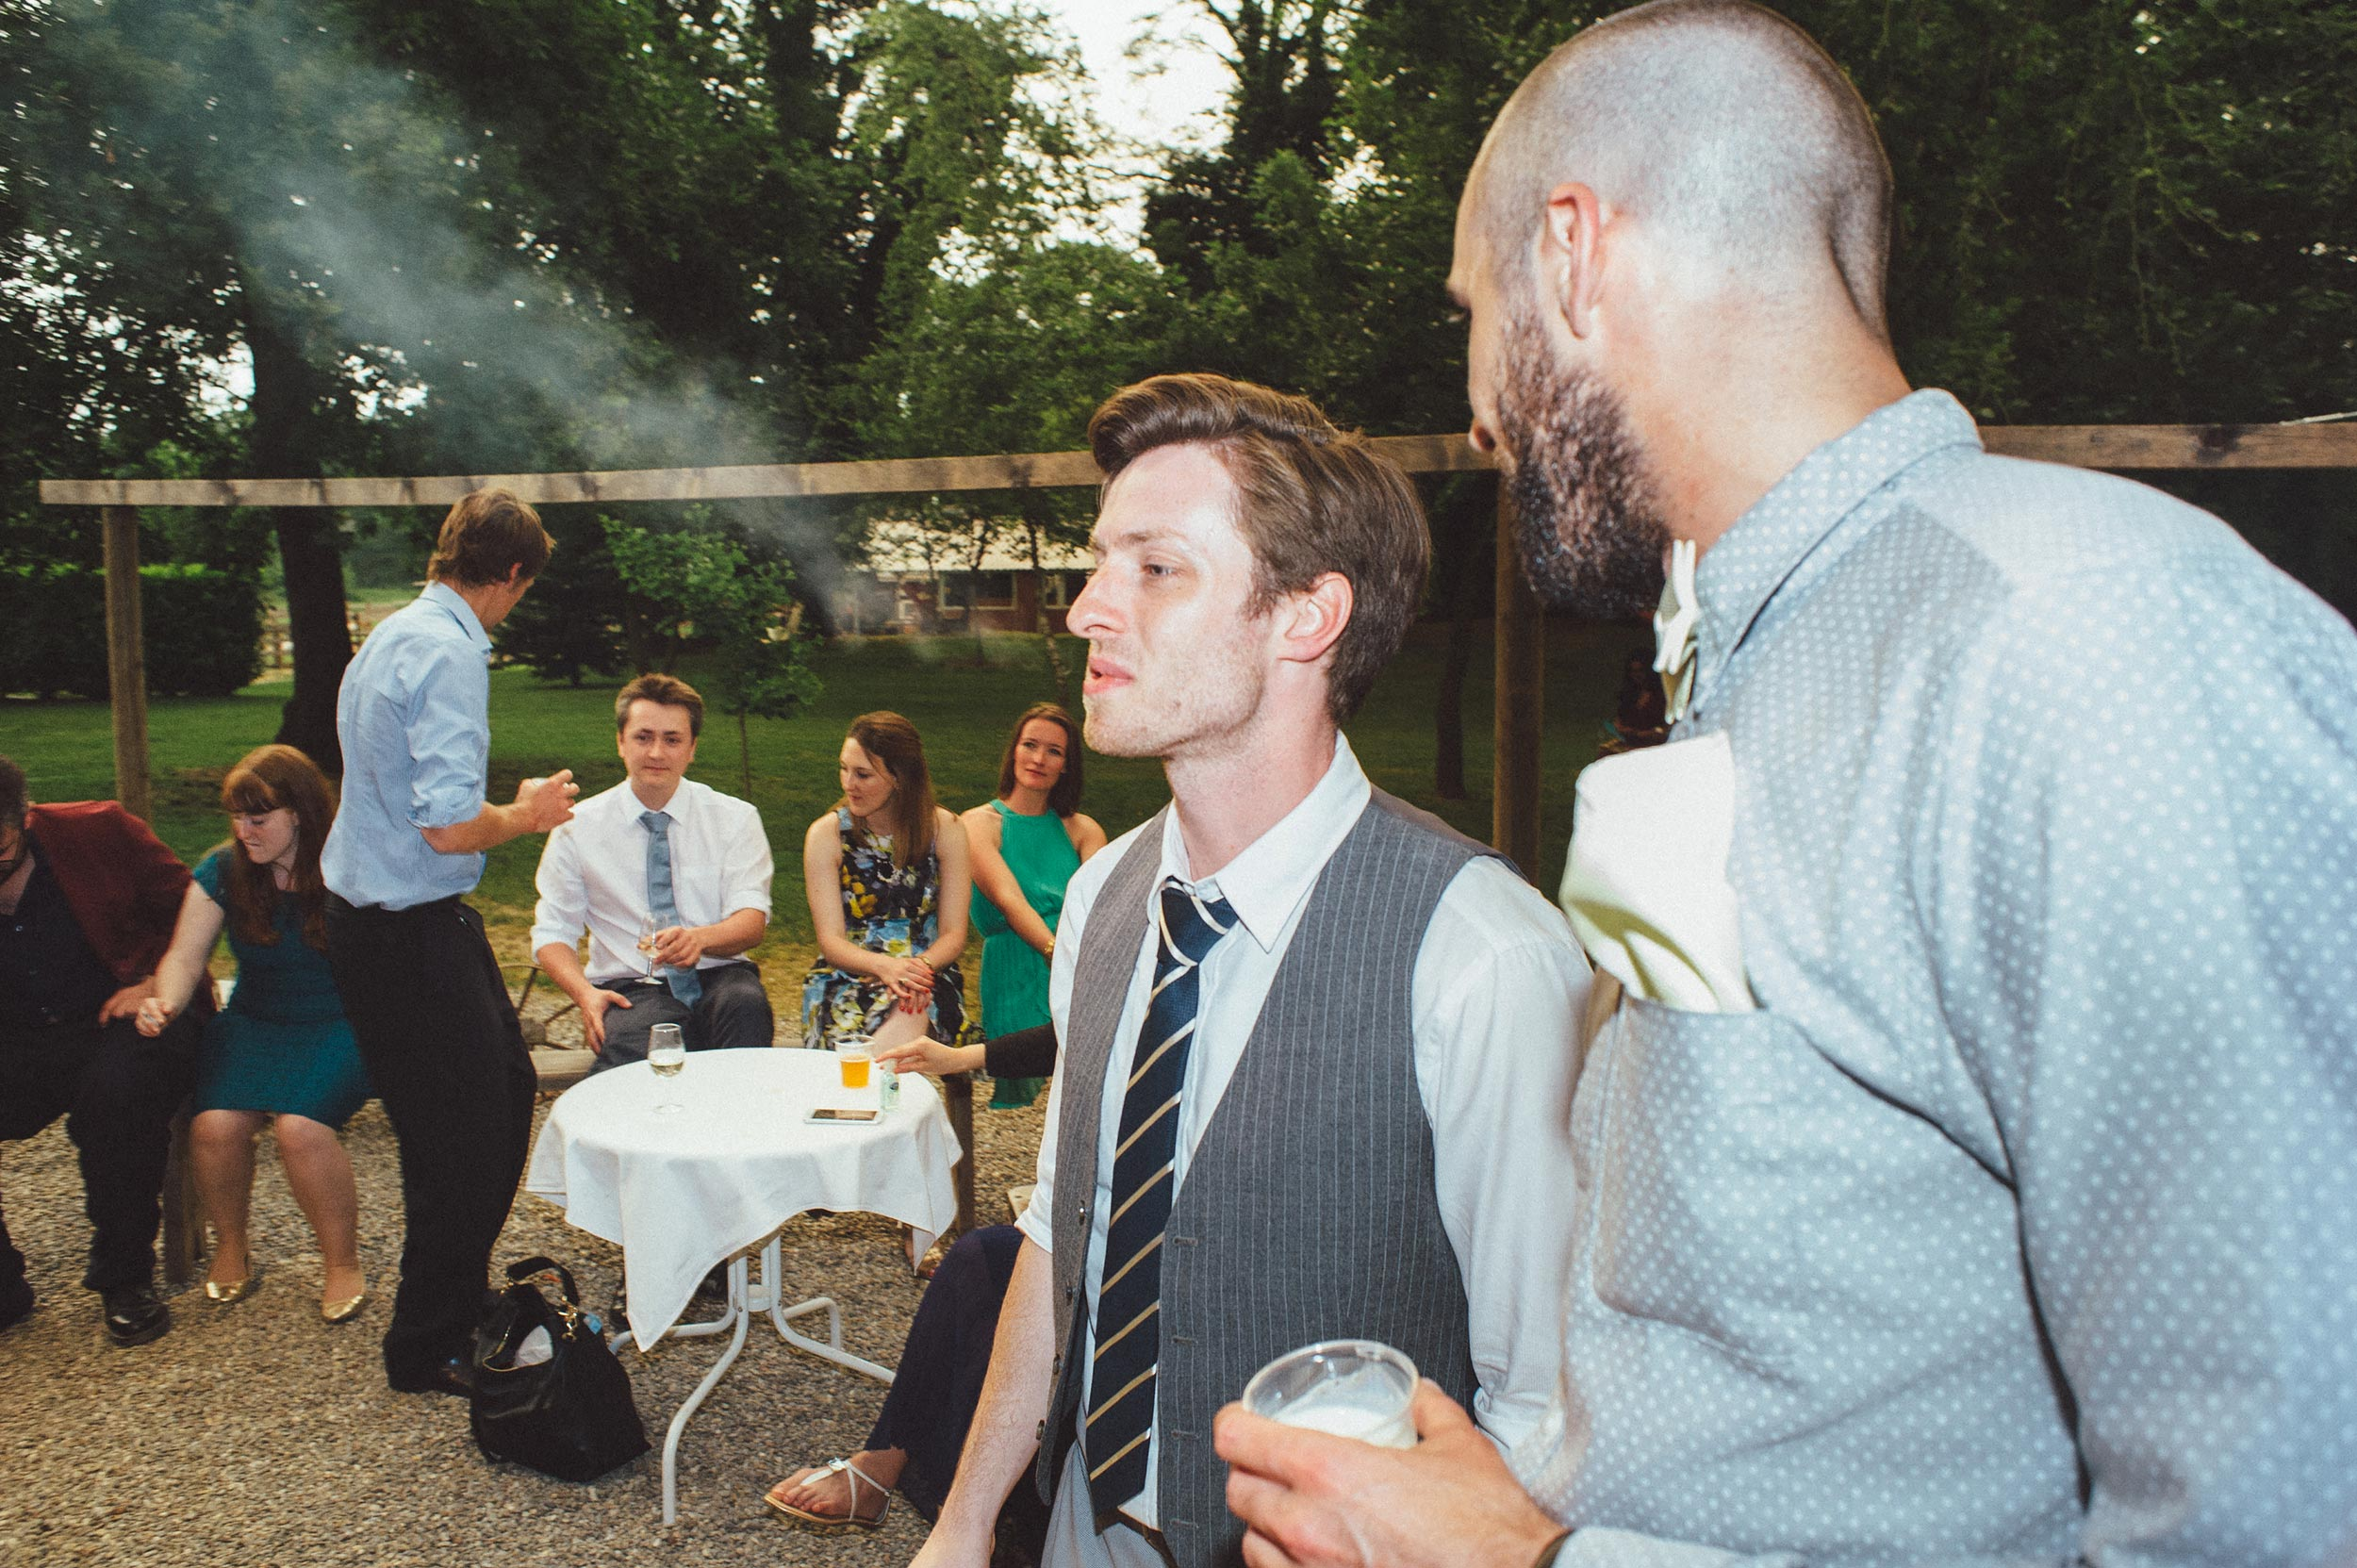 2016-Julius-Silke-Lake-Orta-Wedding-Photographer-Italy-Alessandro-Avenali-105.jpg